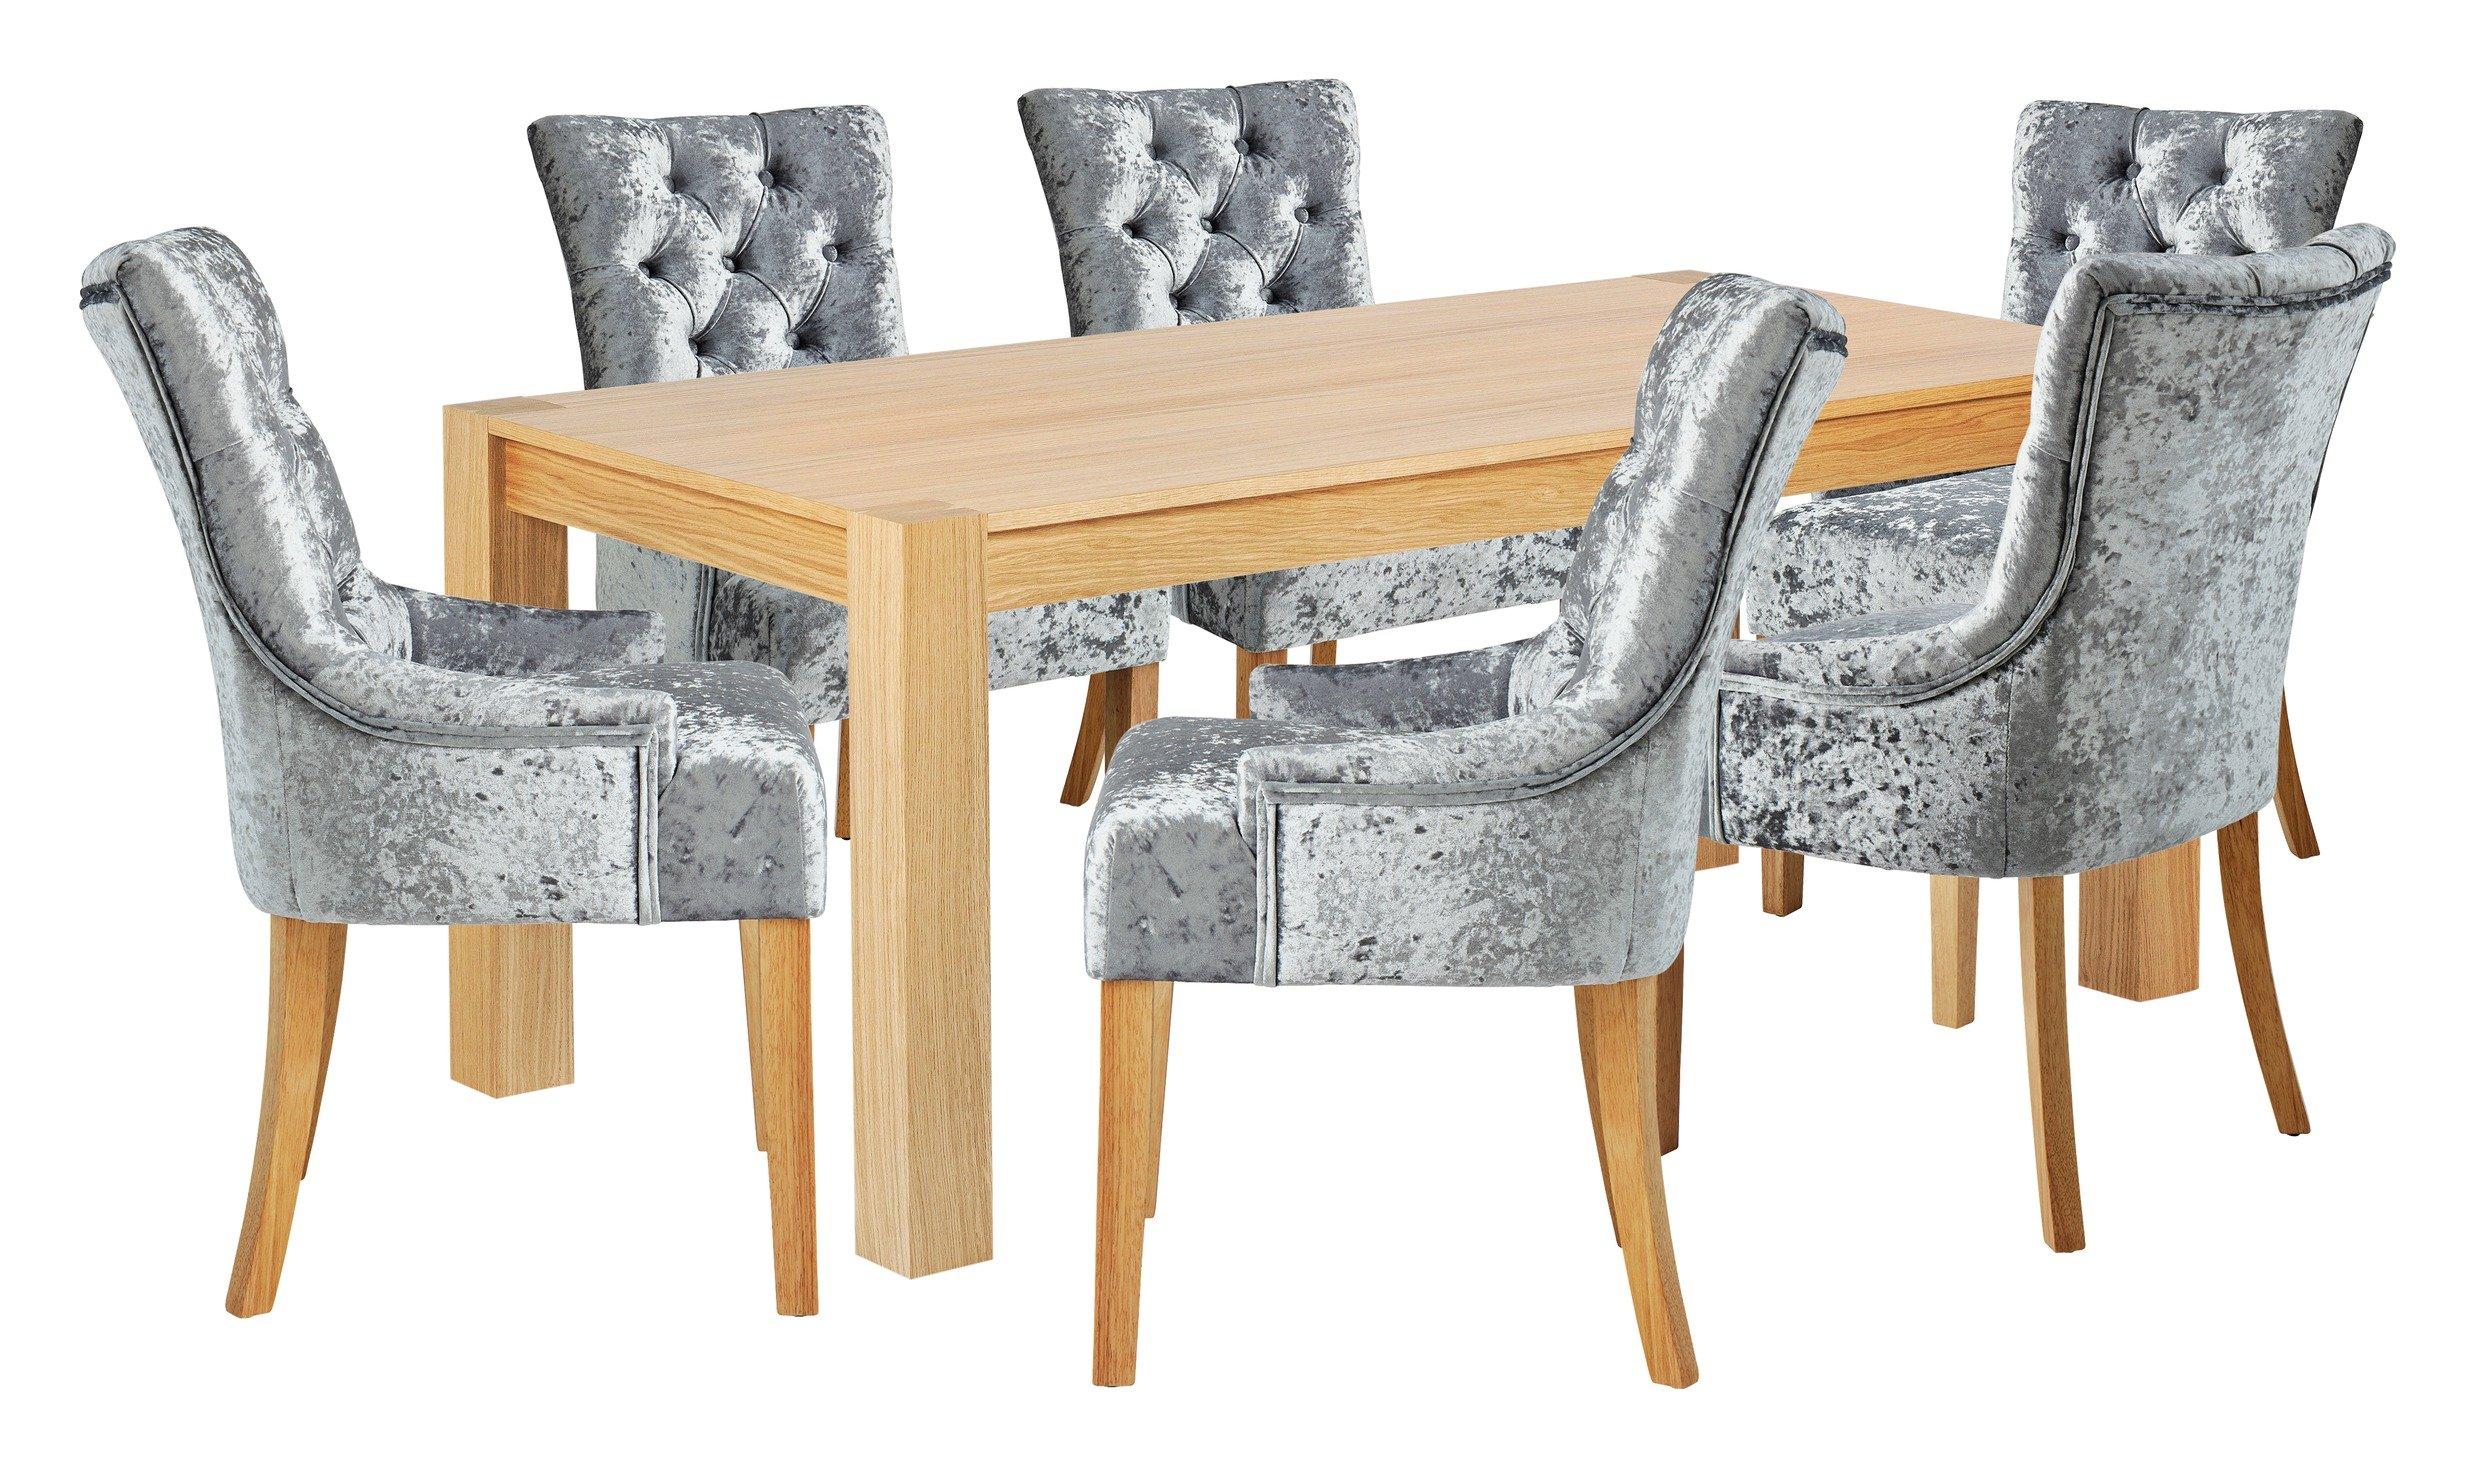 Image of Heart of House Halwick Oak Veneer Table & 6 Chairs - Grey